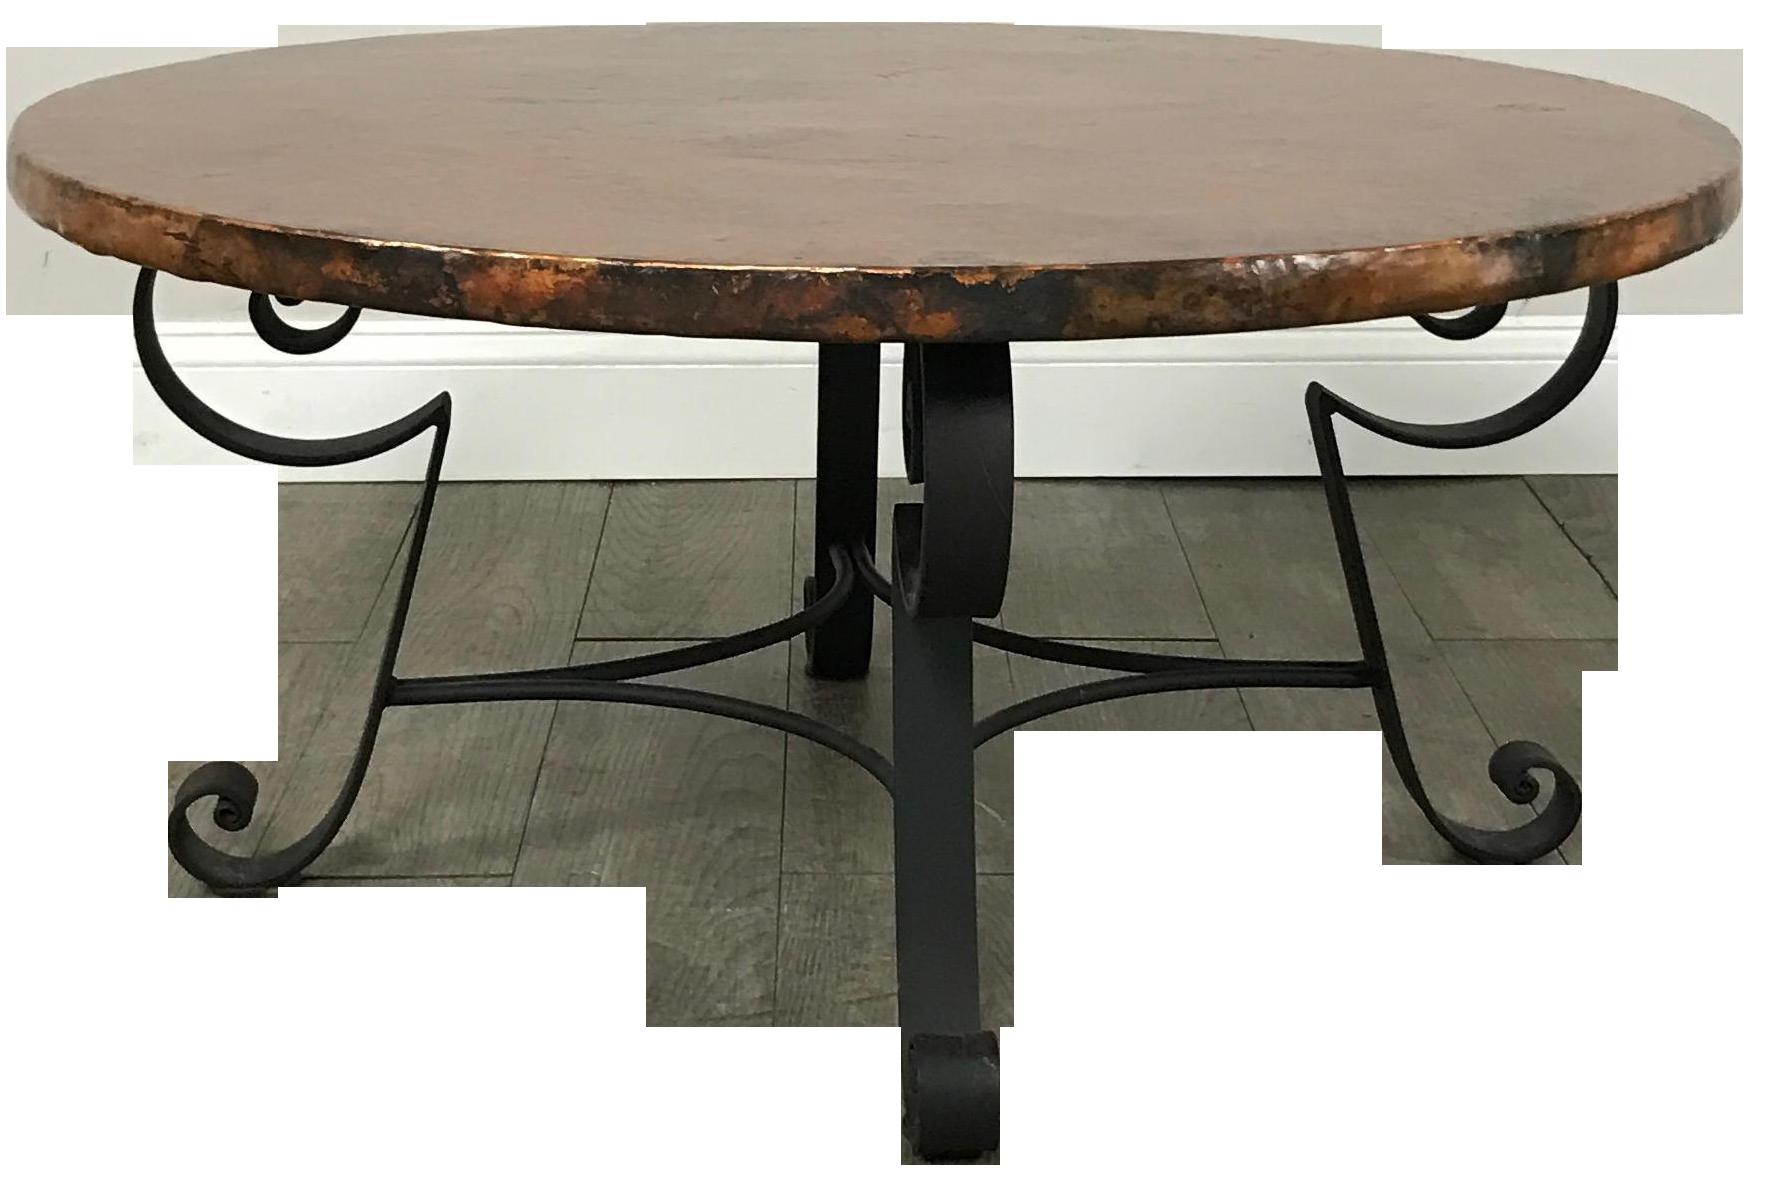 Arhaus CopperTop Coffee Table Chairish